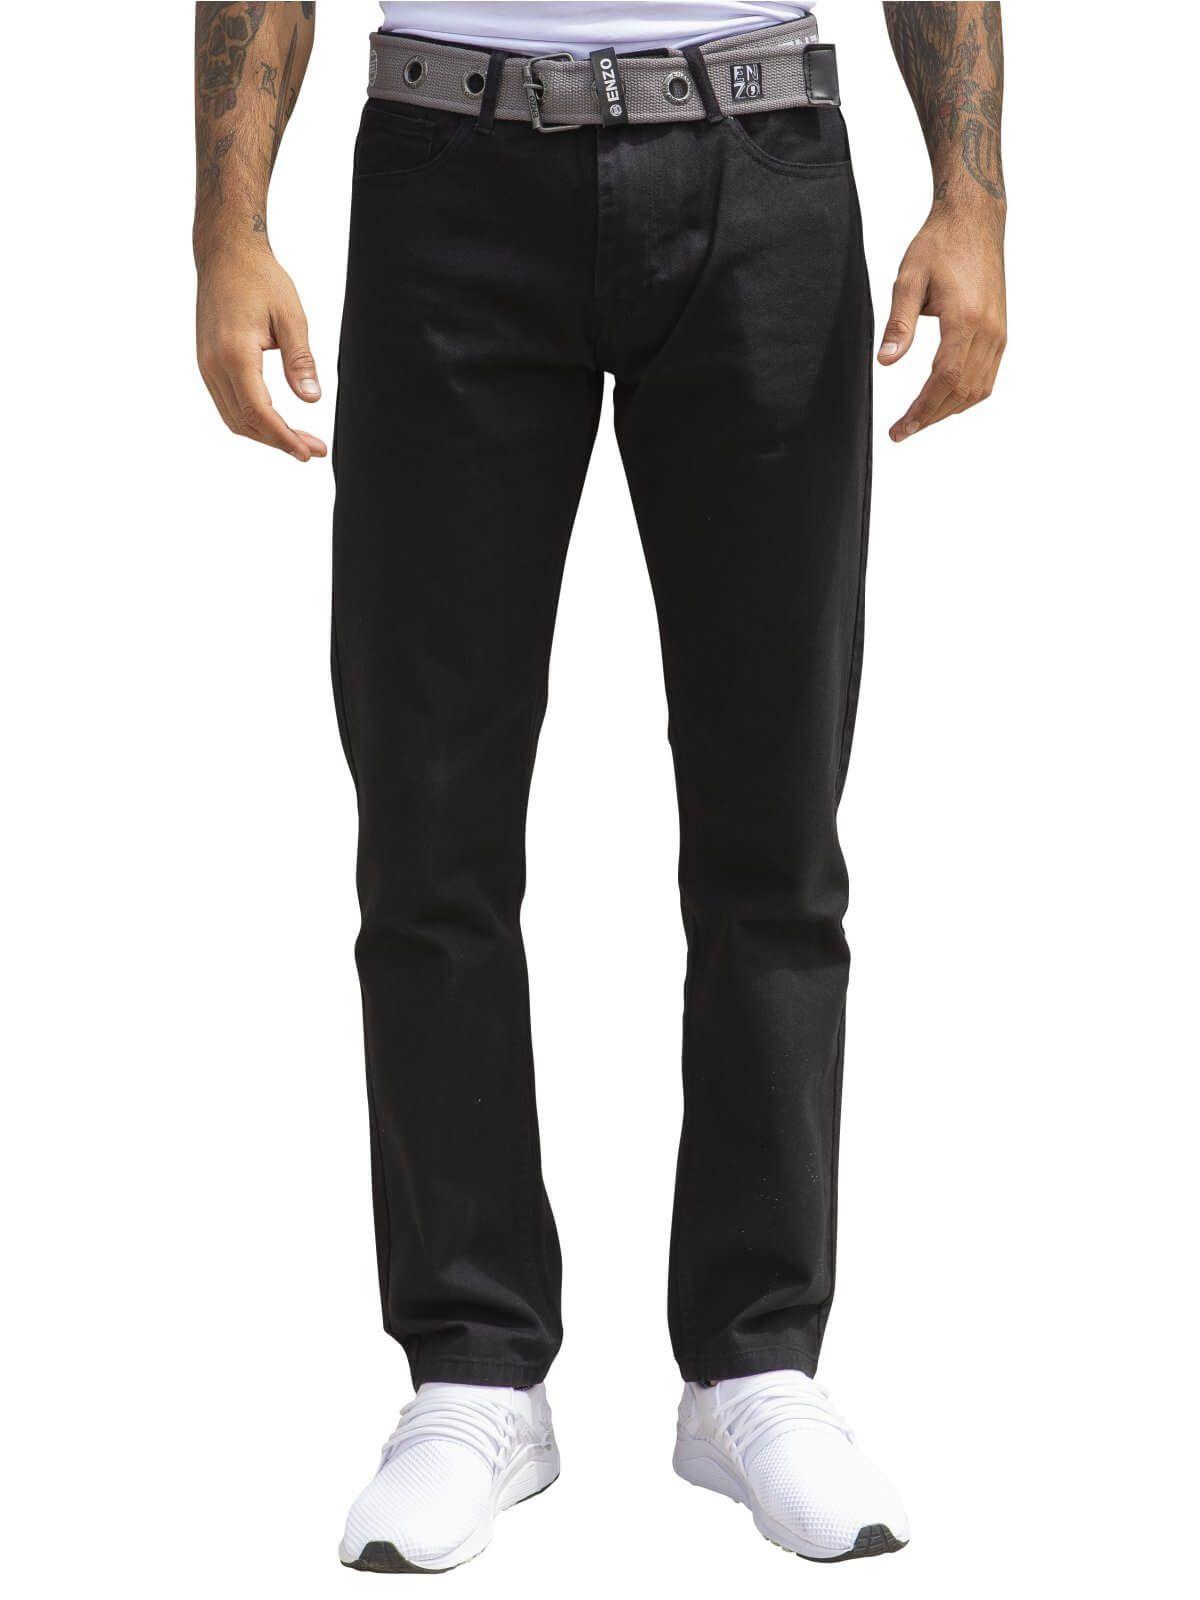 Mens Designer  Regular  Fit Denim Jeans | Enzo Designer Menswear